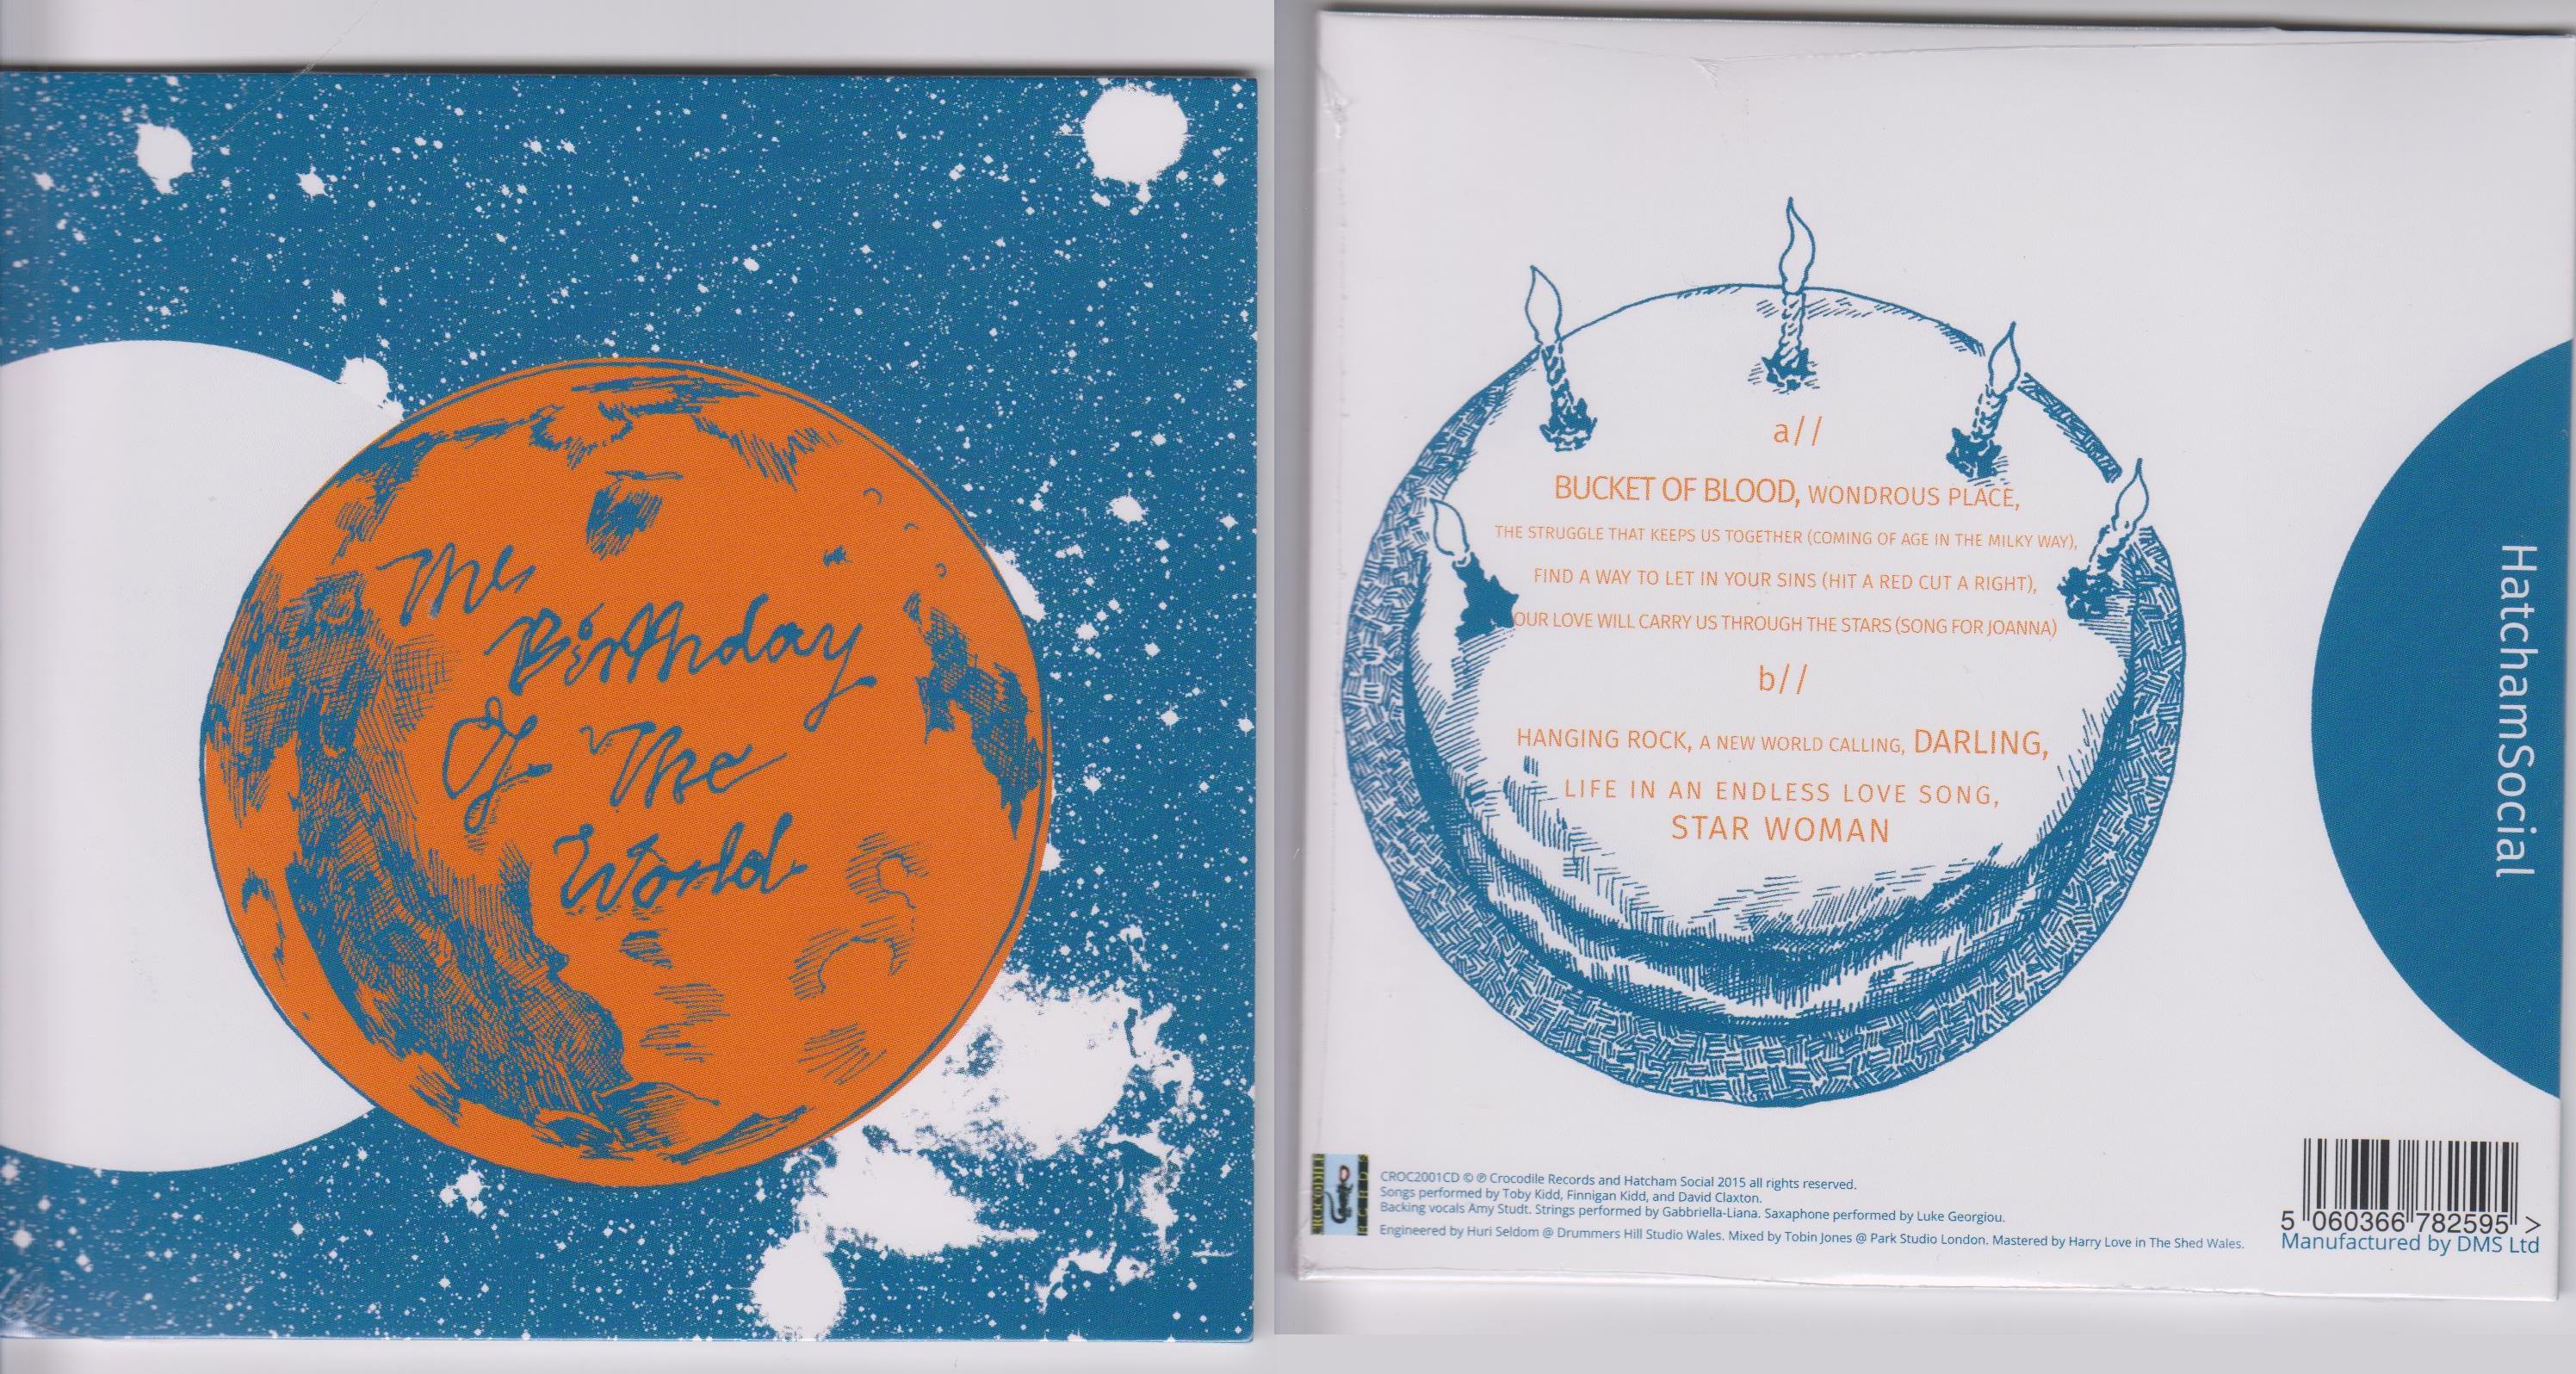 Hatcham Social - The Birthday of the World